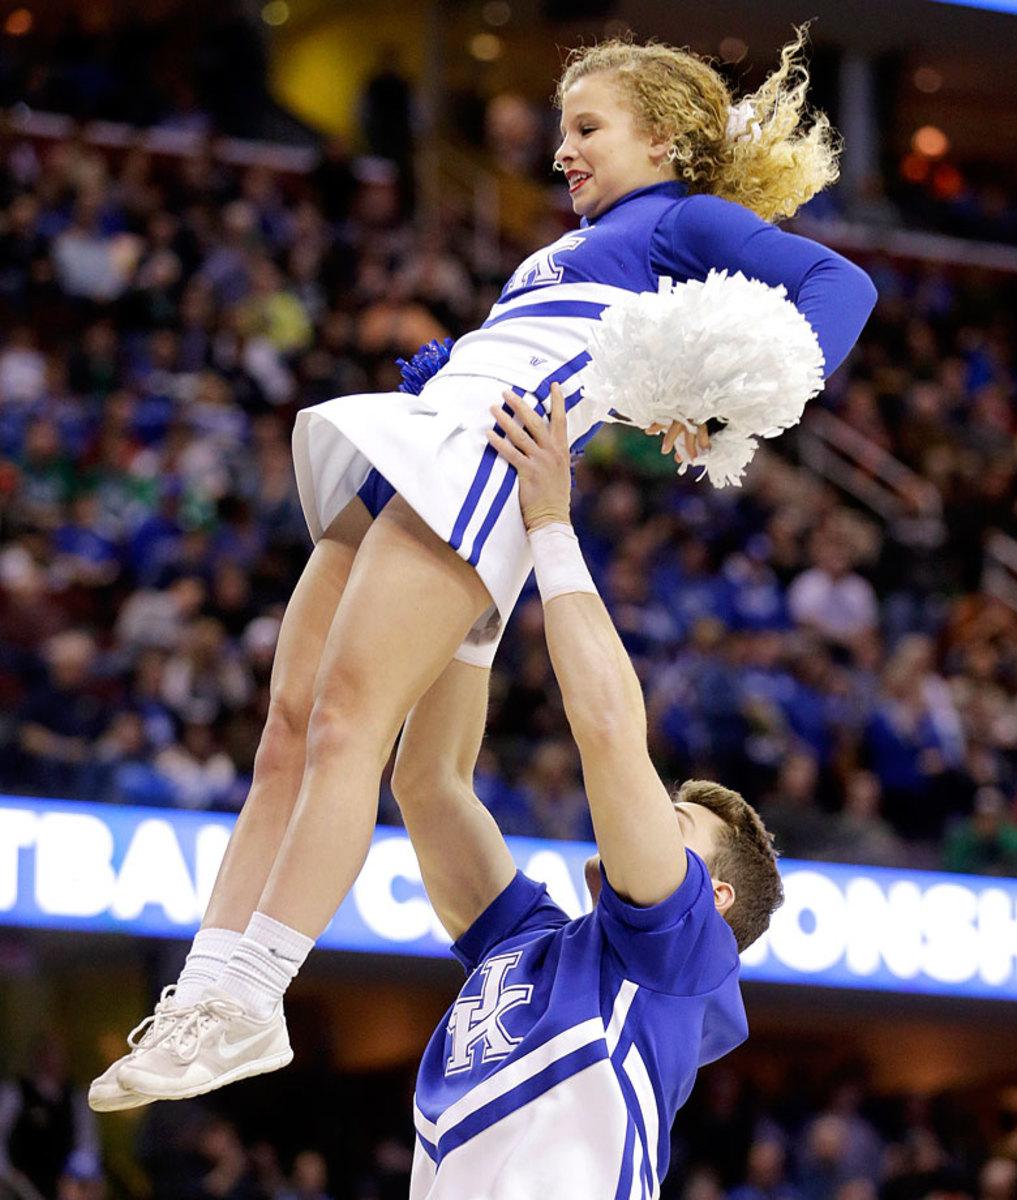 Kentucky-cheerleaders-16233e939c124ca5a3c880b99dbd728e-0.jpg